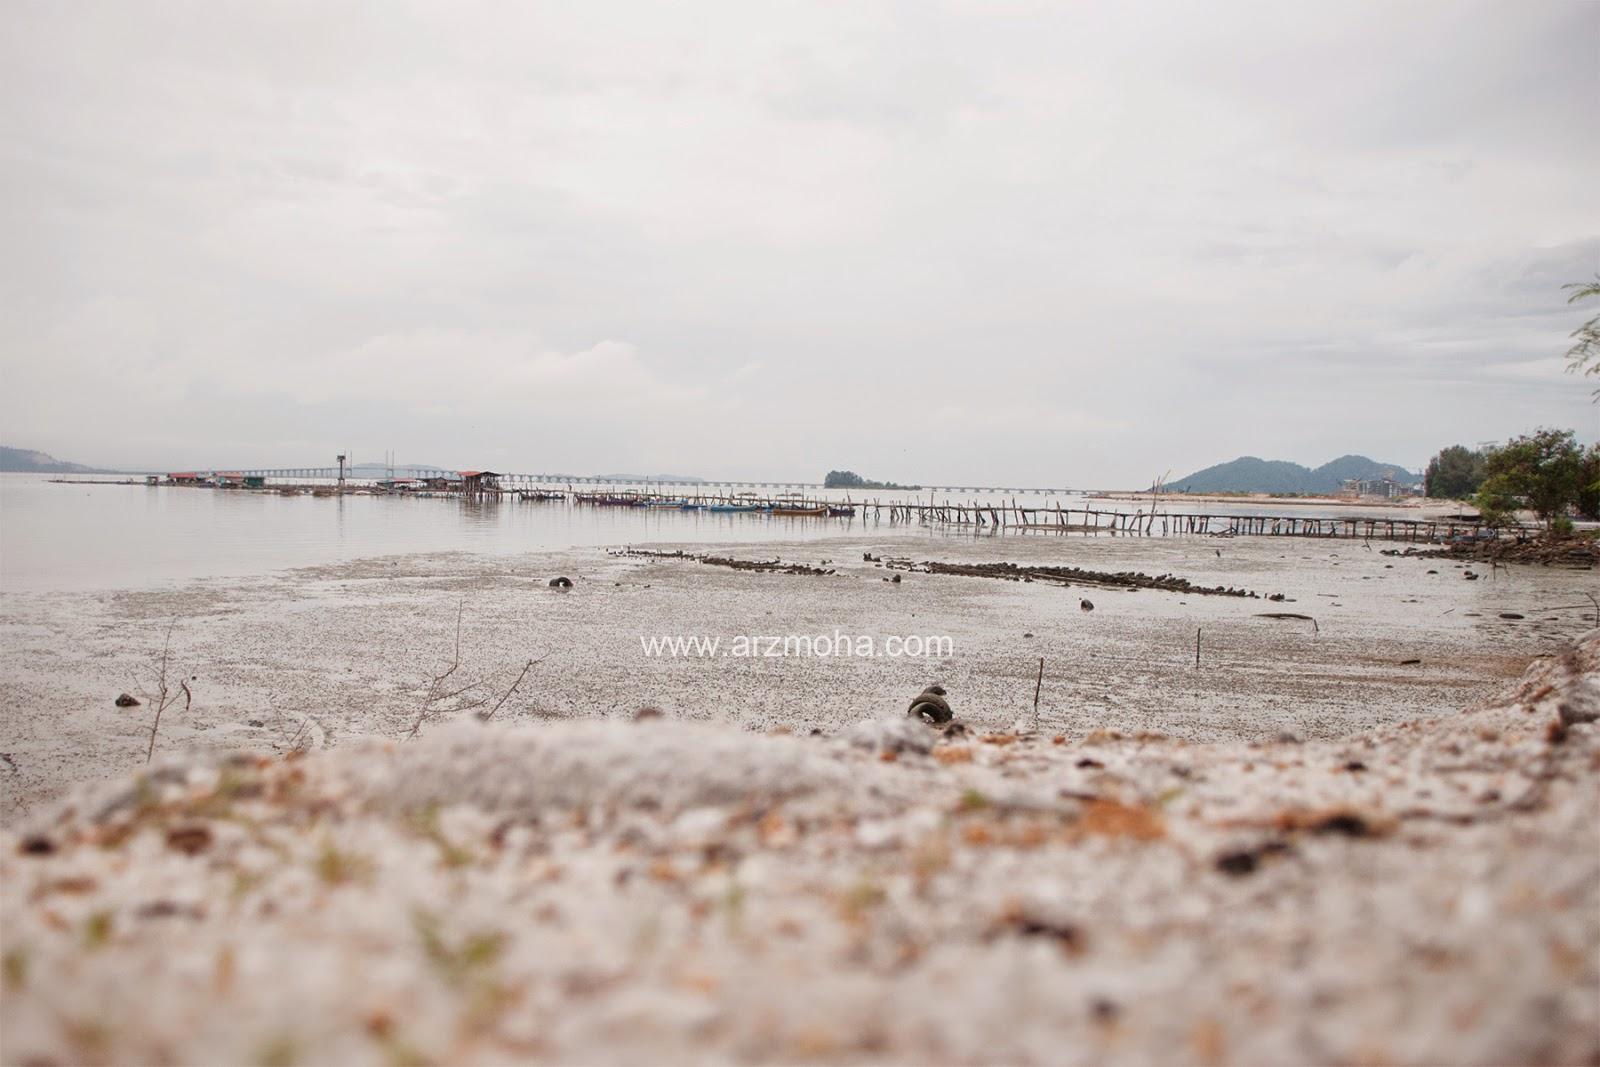 Lanscape, jetty, Nelayan, Fisherman, kenangan, gambar cantik, arzmoha